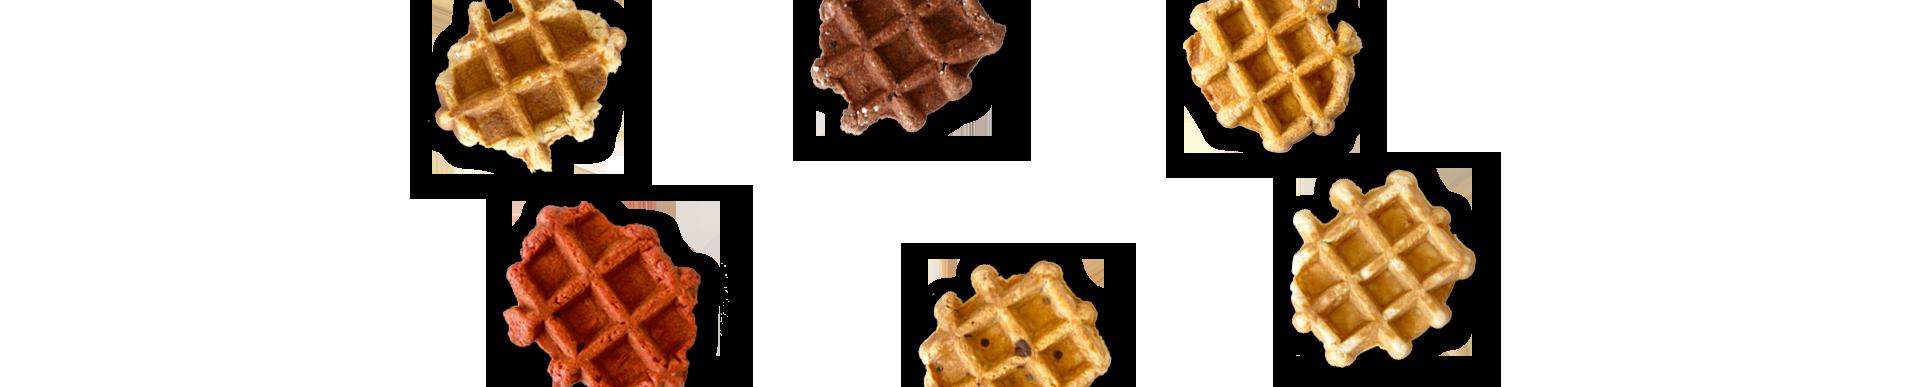 Waffle clipart chocolate waffle. Wafflewaffle buy gourmet belgian